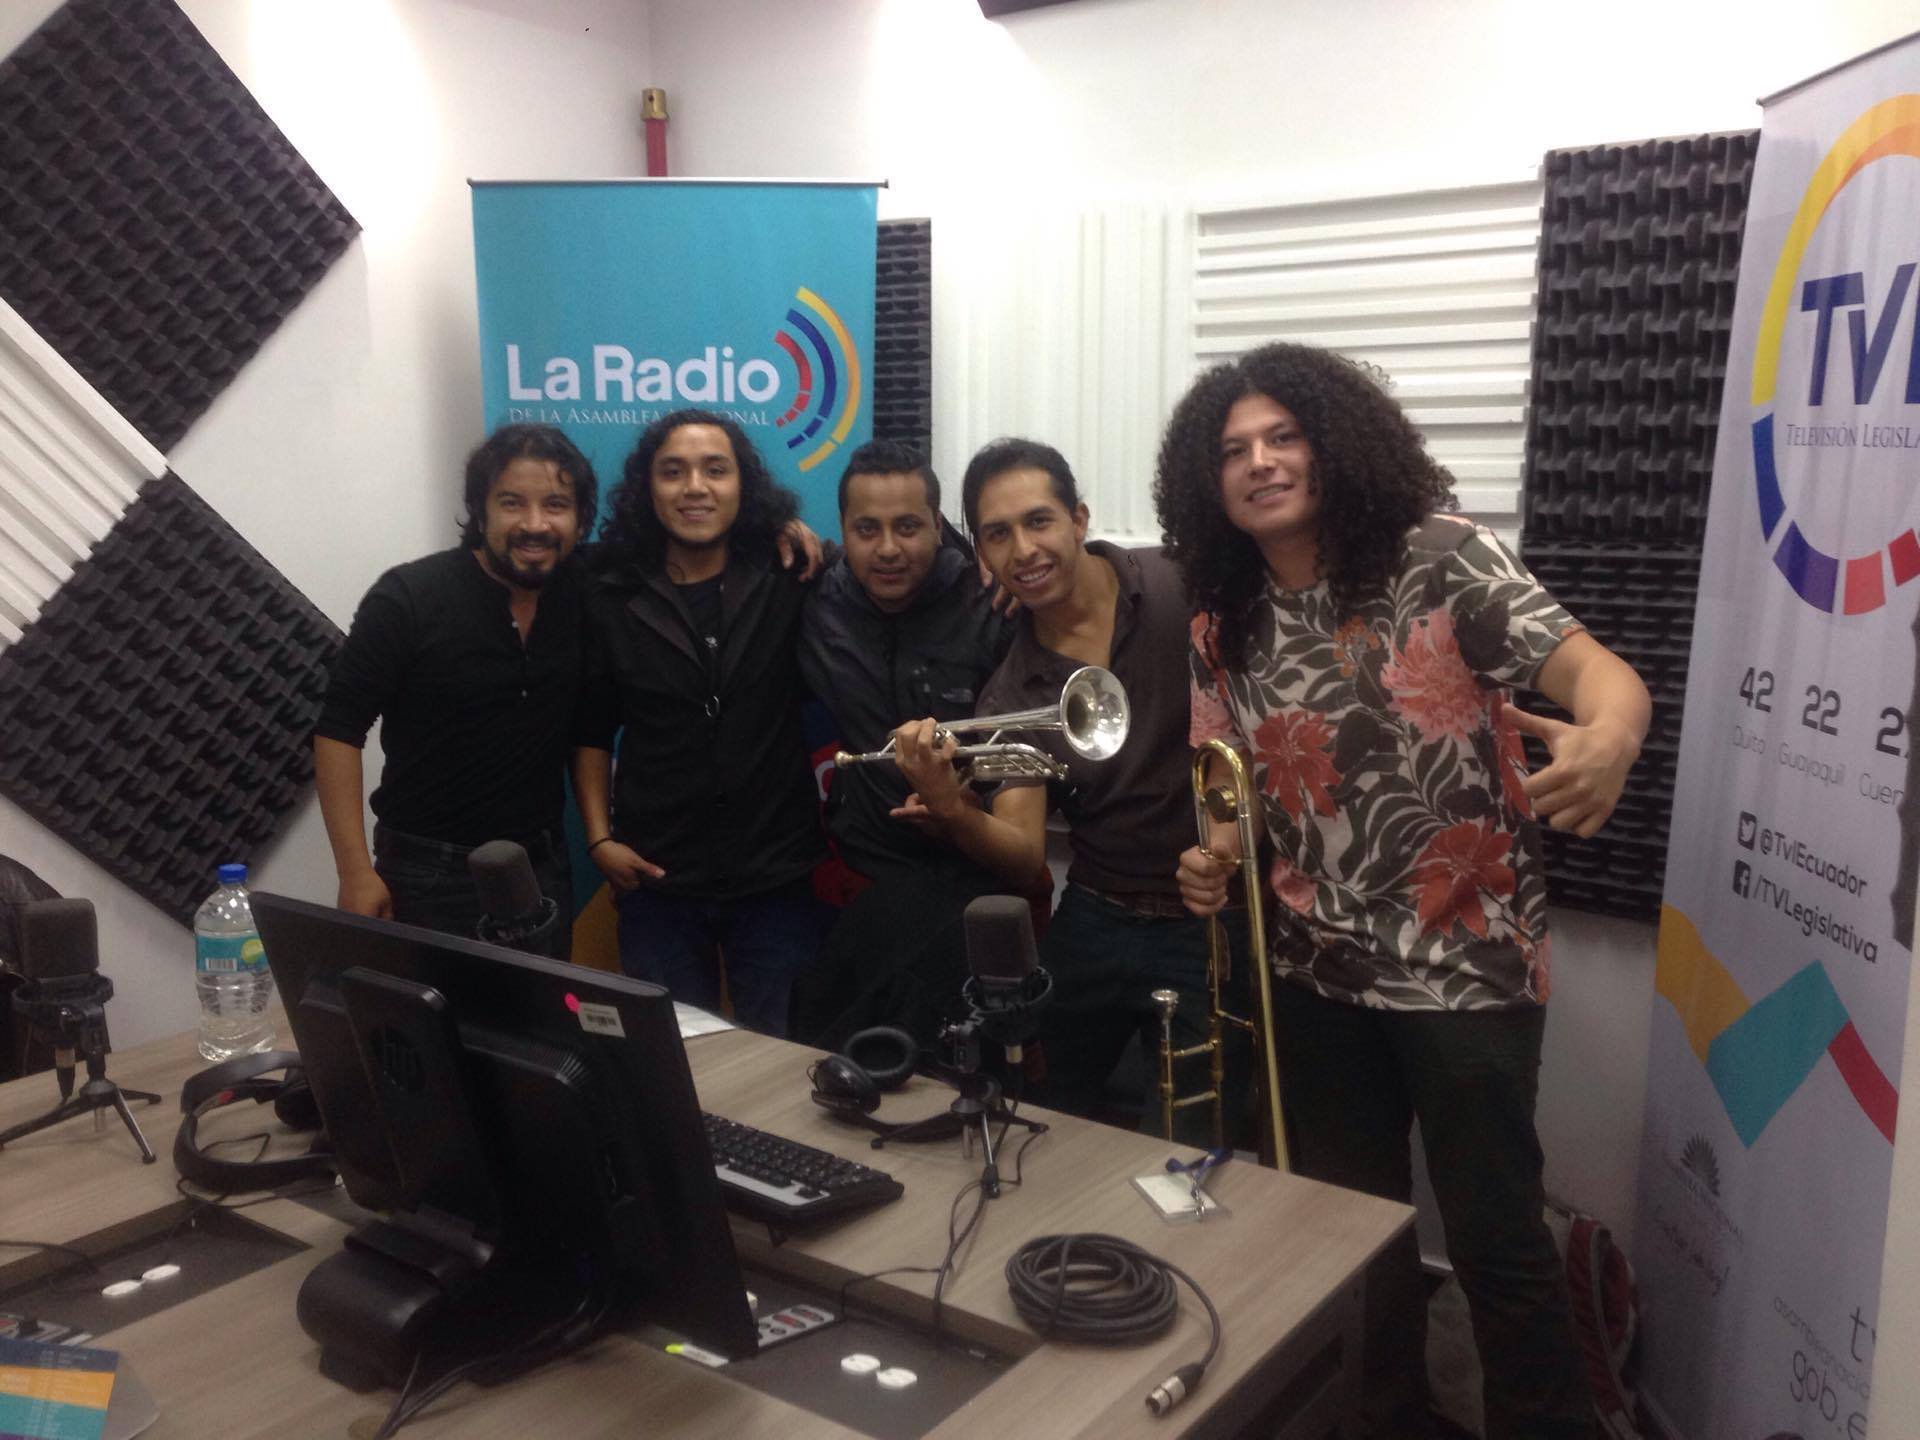 Entrevista a Quina y Caña